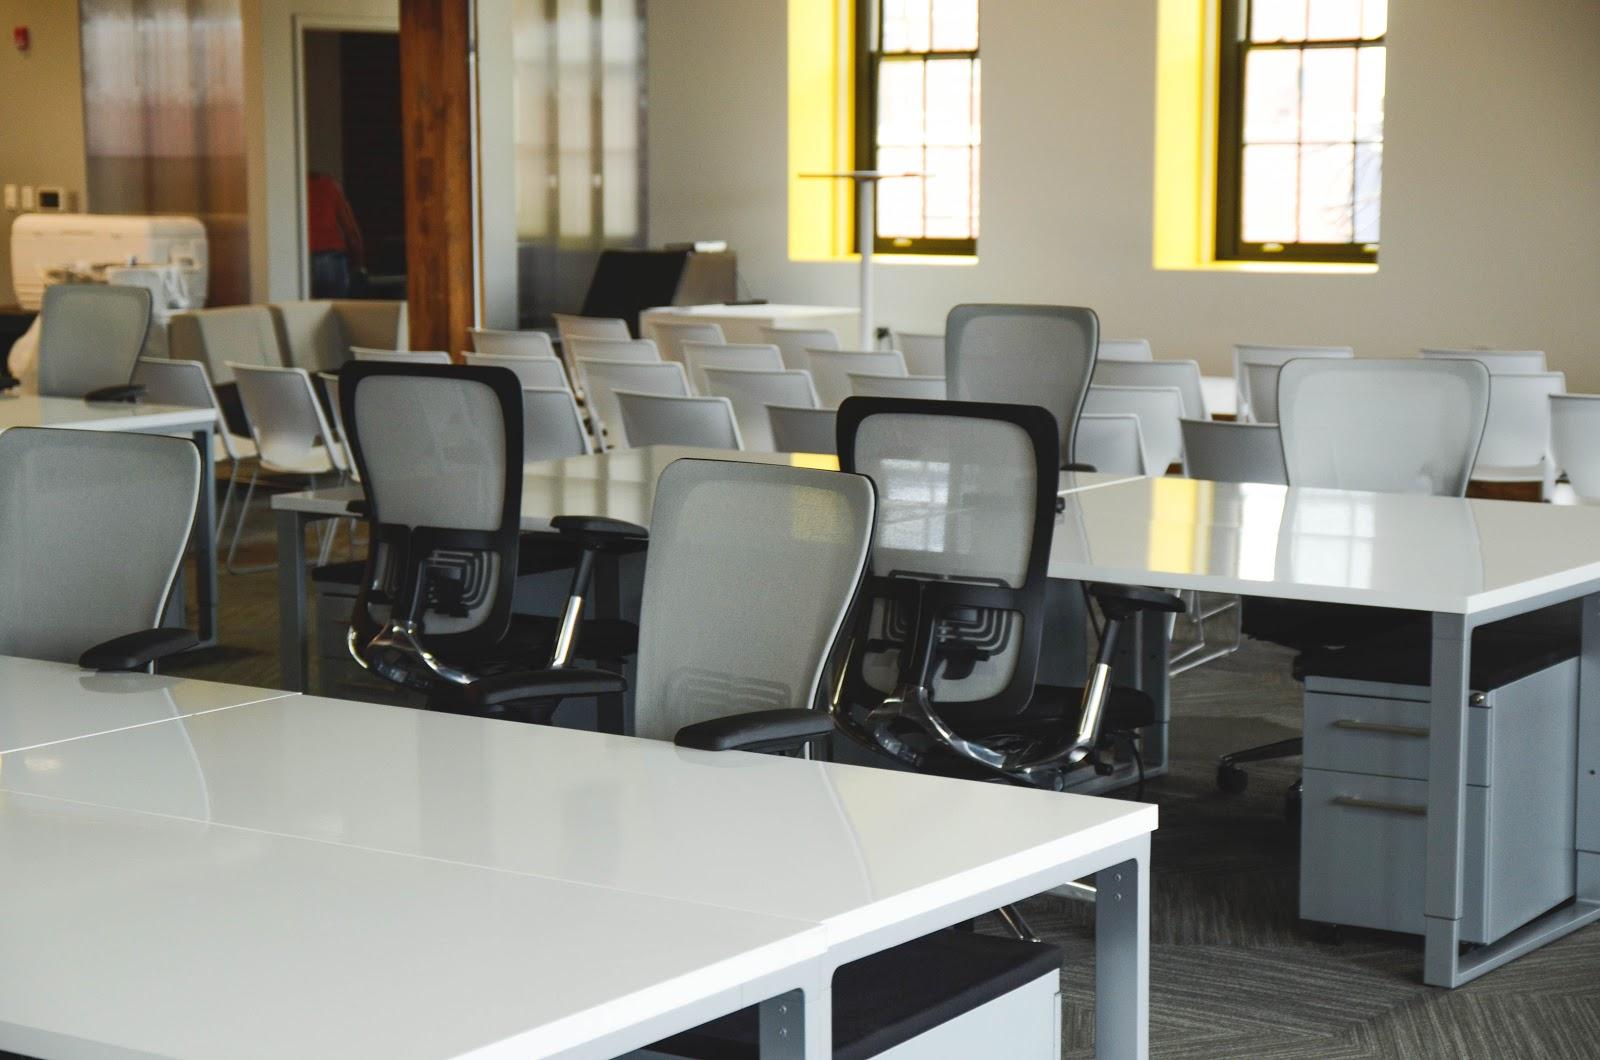 space-desk-office-workspace.jpg